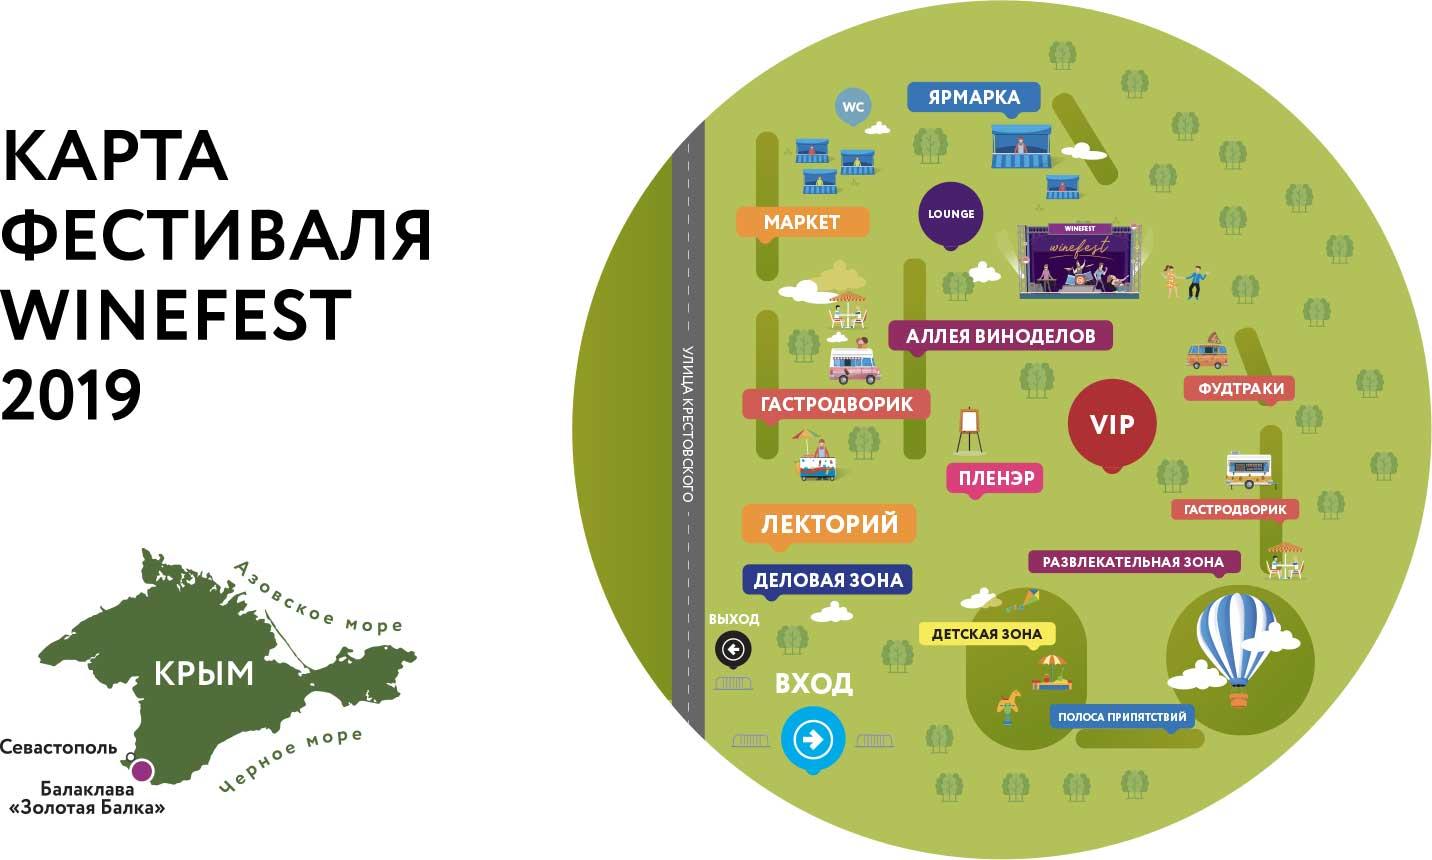 «WineFest» — фестиваль молодого вина в Балаклаве 2019 (28-29 сентября)